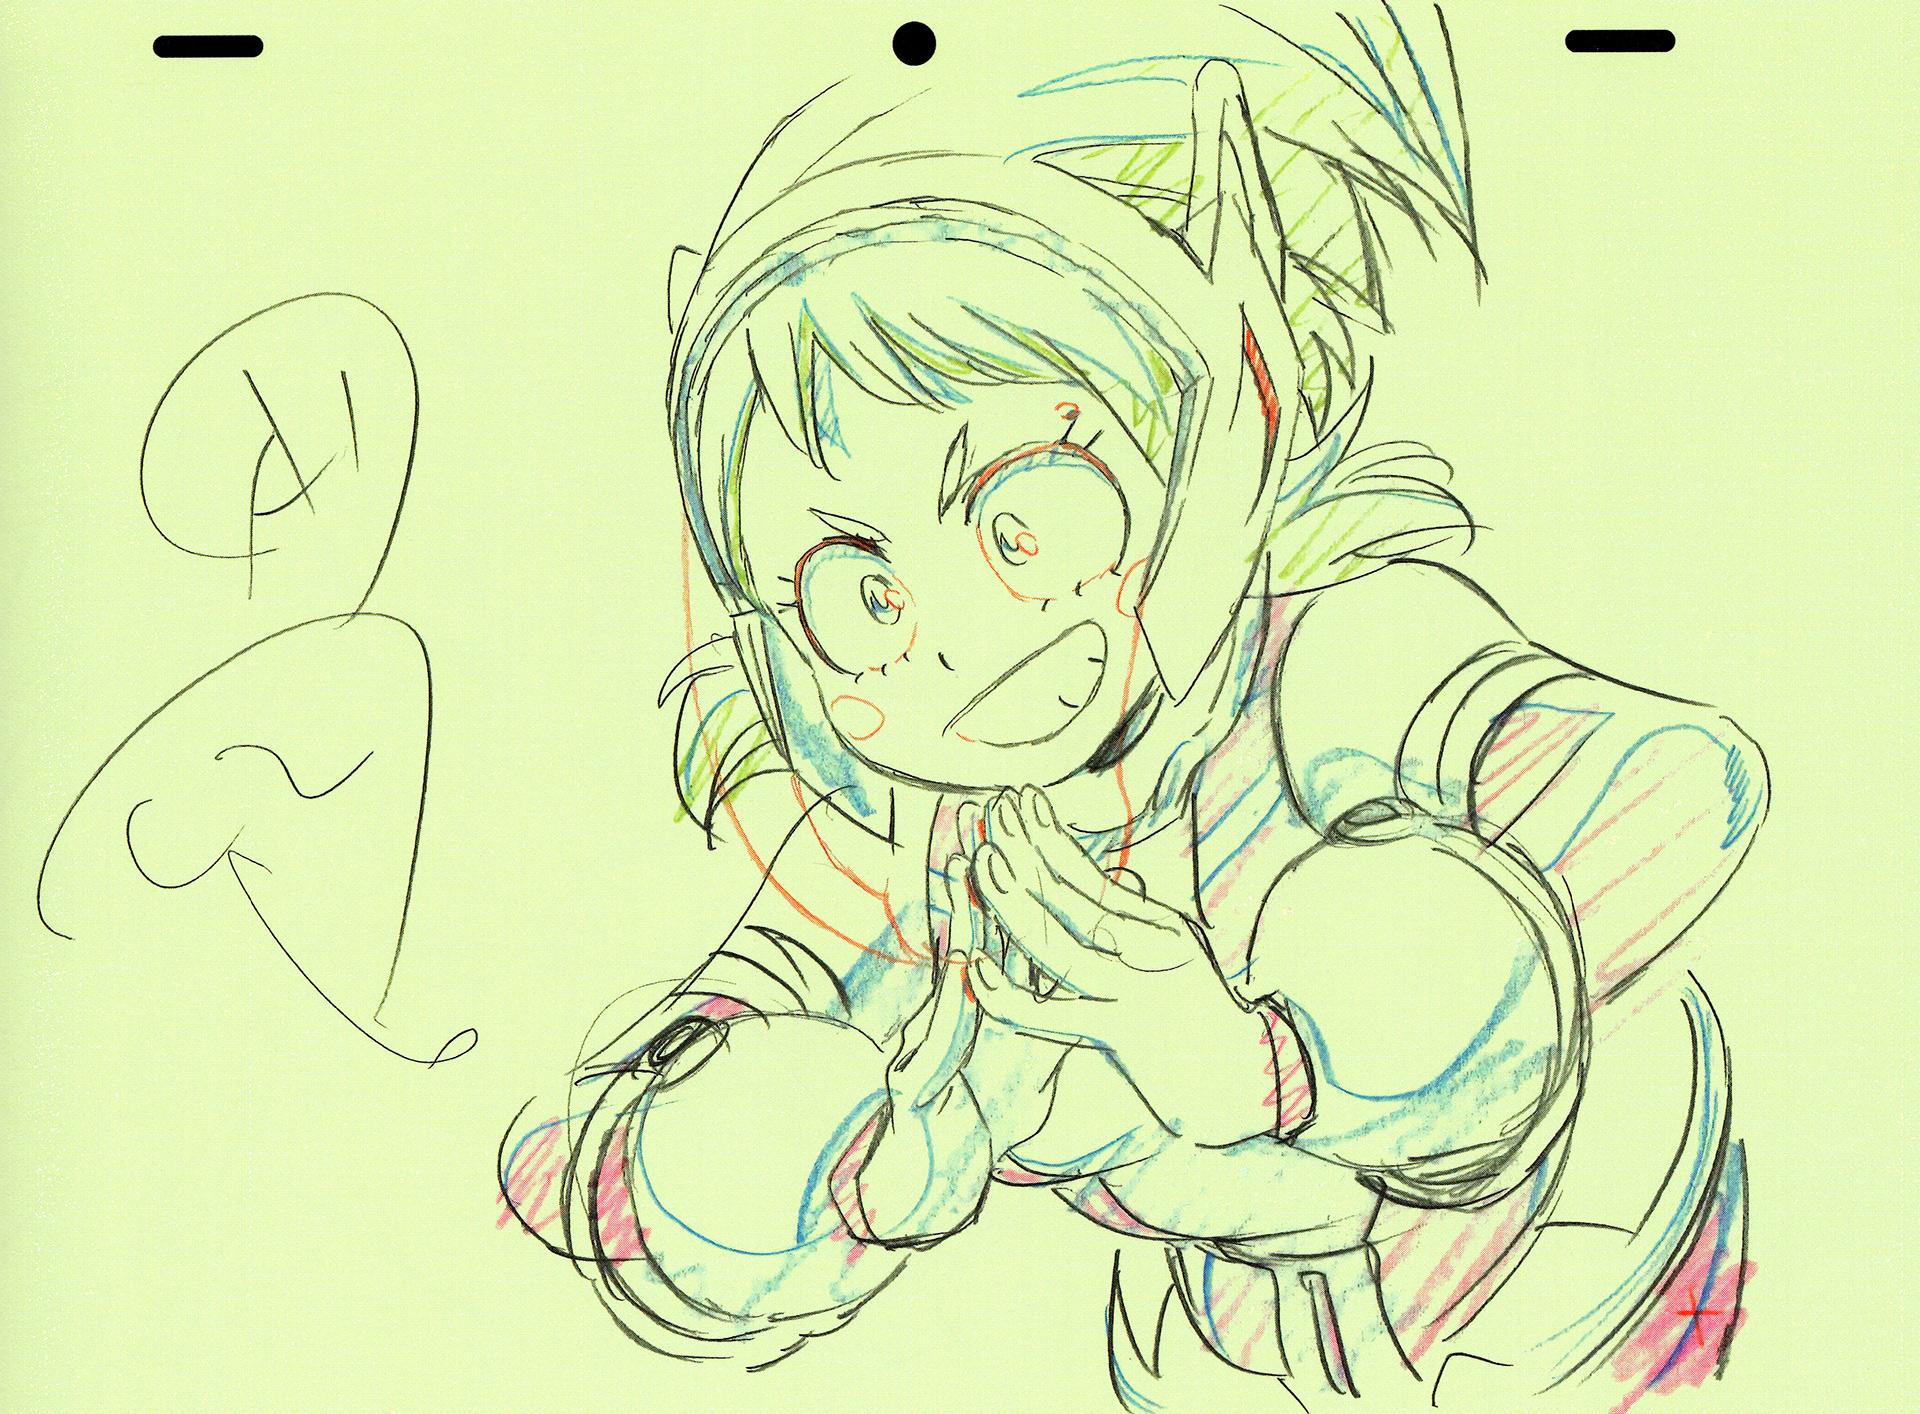 Arts Of Yoshihiko Umakoshi Animation Key Frame My Hero Book Vol.2